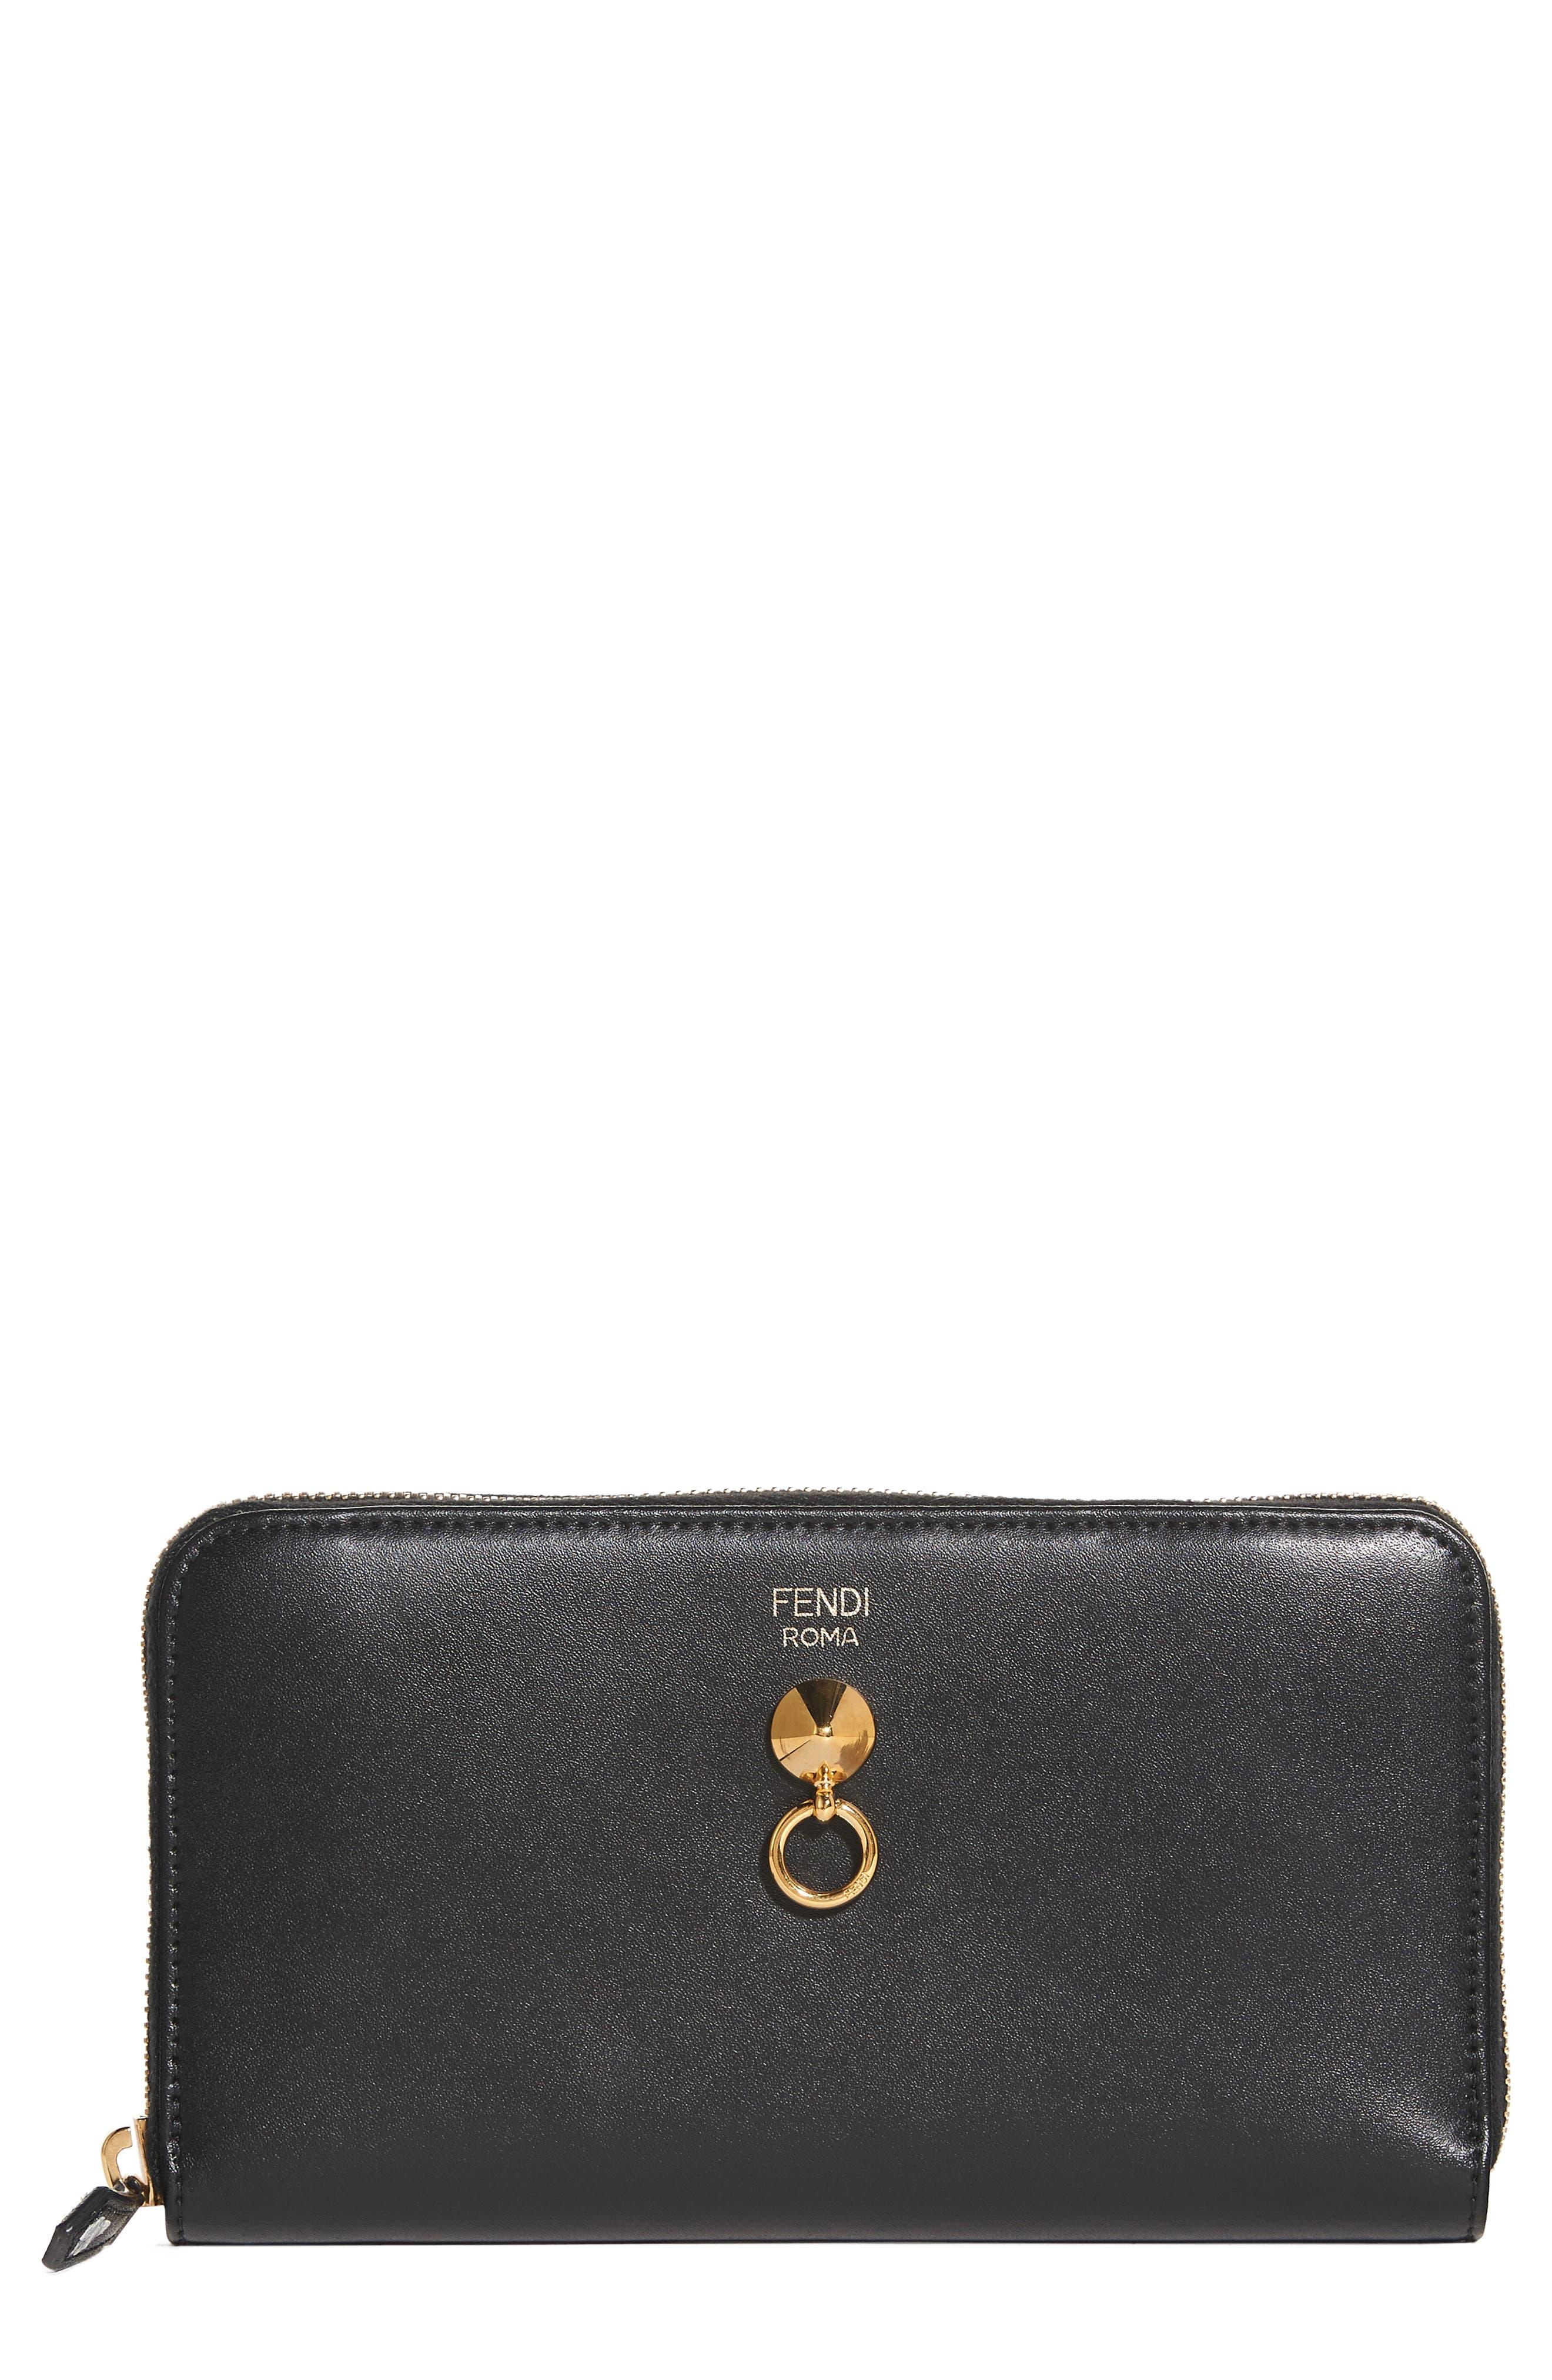 Fendi Liberty Leather Zip Around Wallet